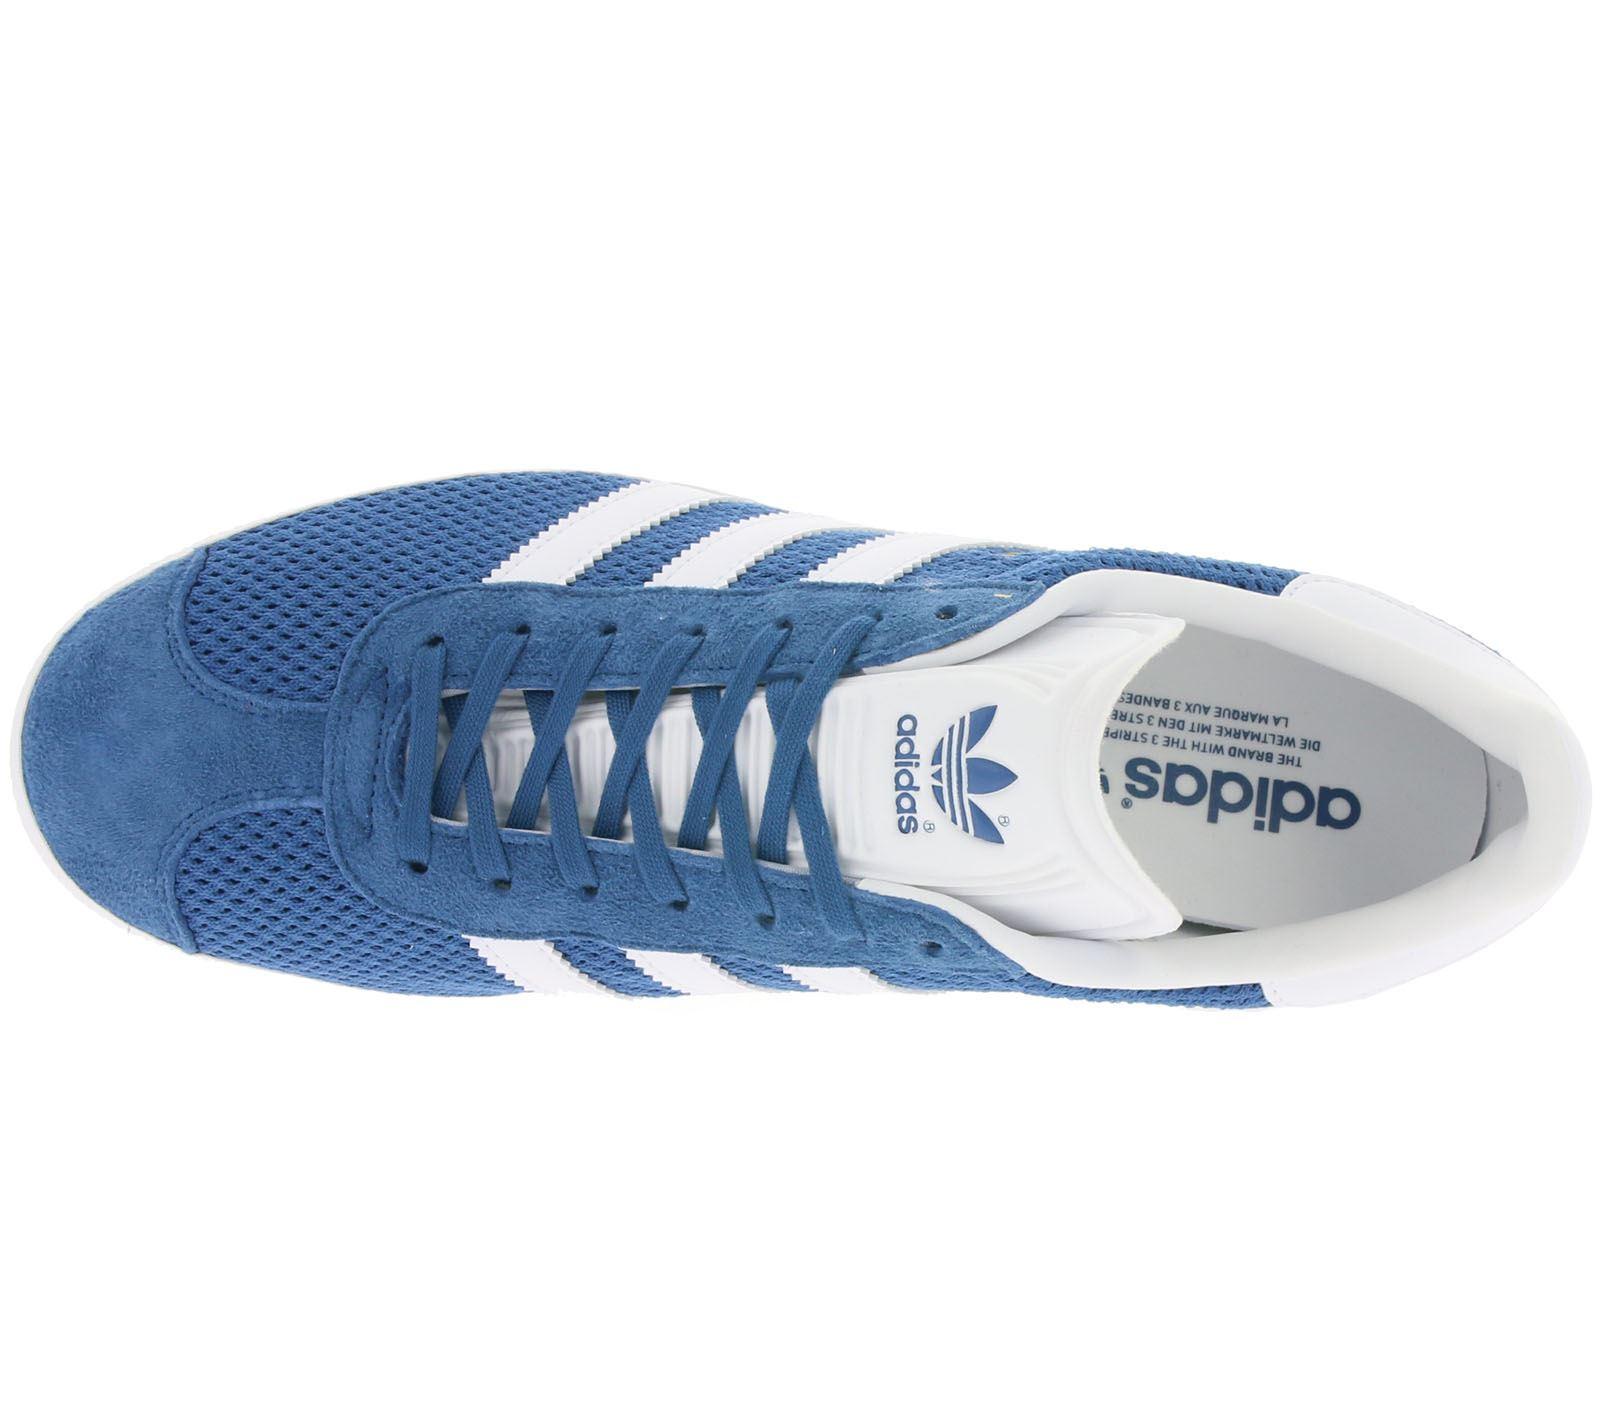 5819b15114e7 adidas Gazelle BB2757 Mens Trainers~Originals~UK 3.5 to 12 Only